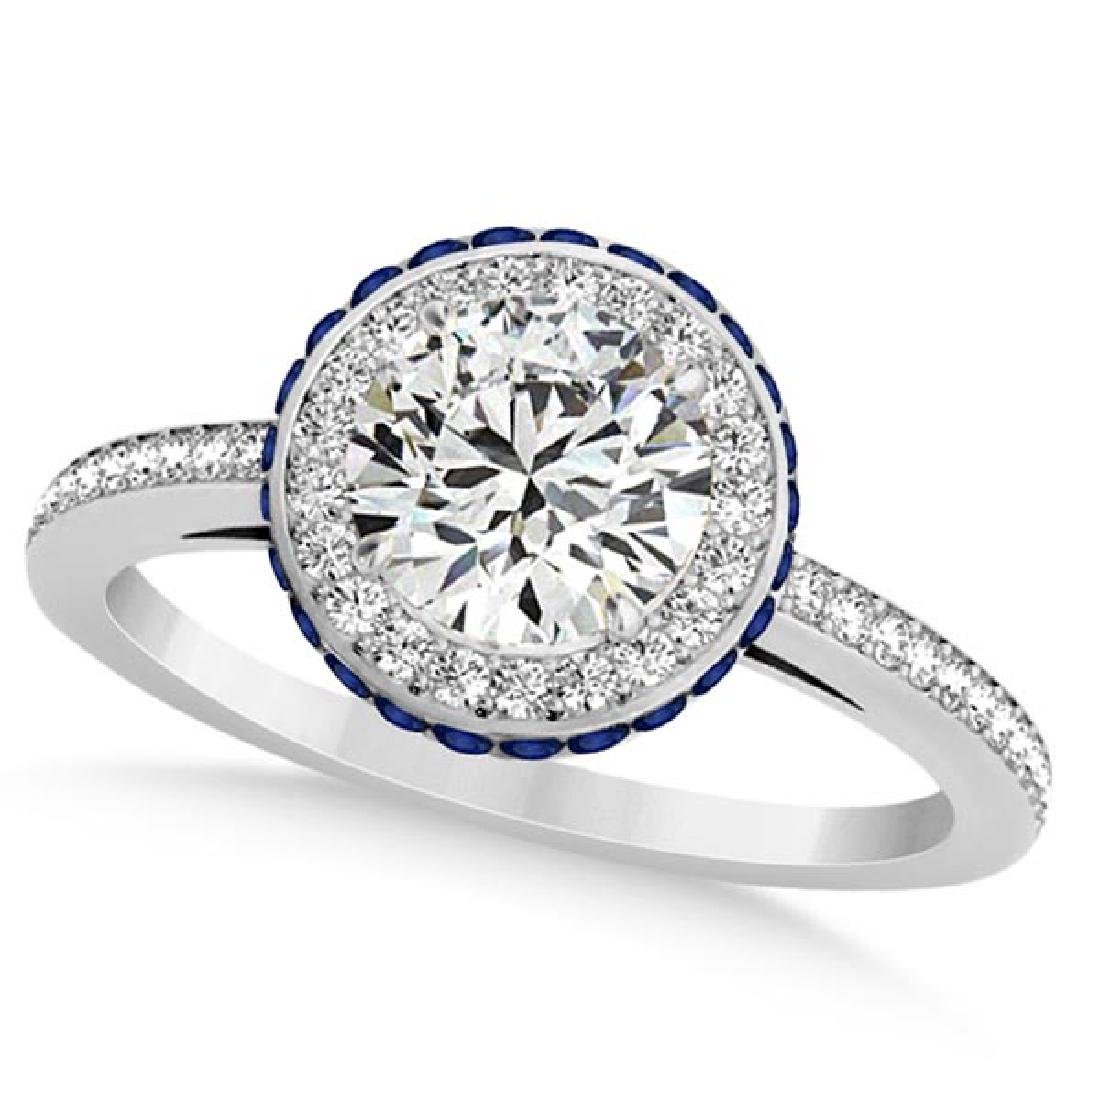 Diamond Halo and Sapphire Gemstone Engagement Ring 14k